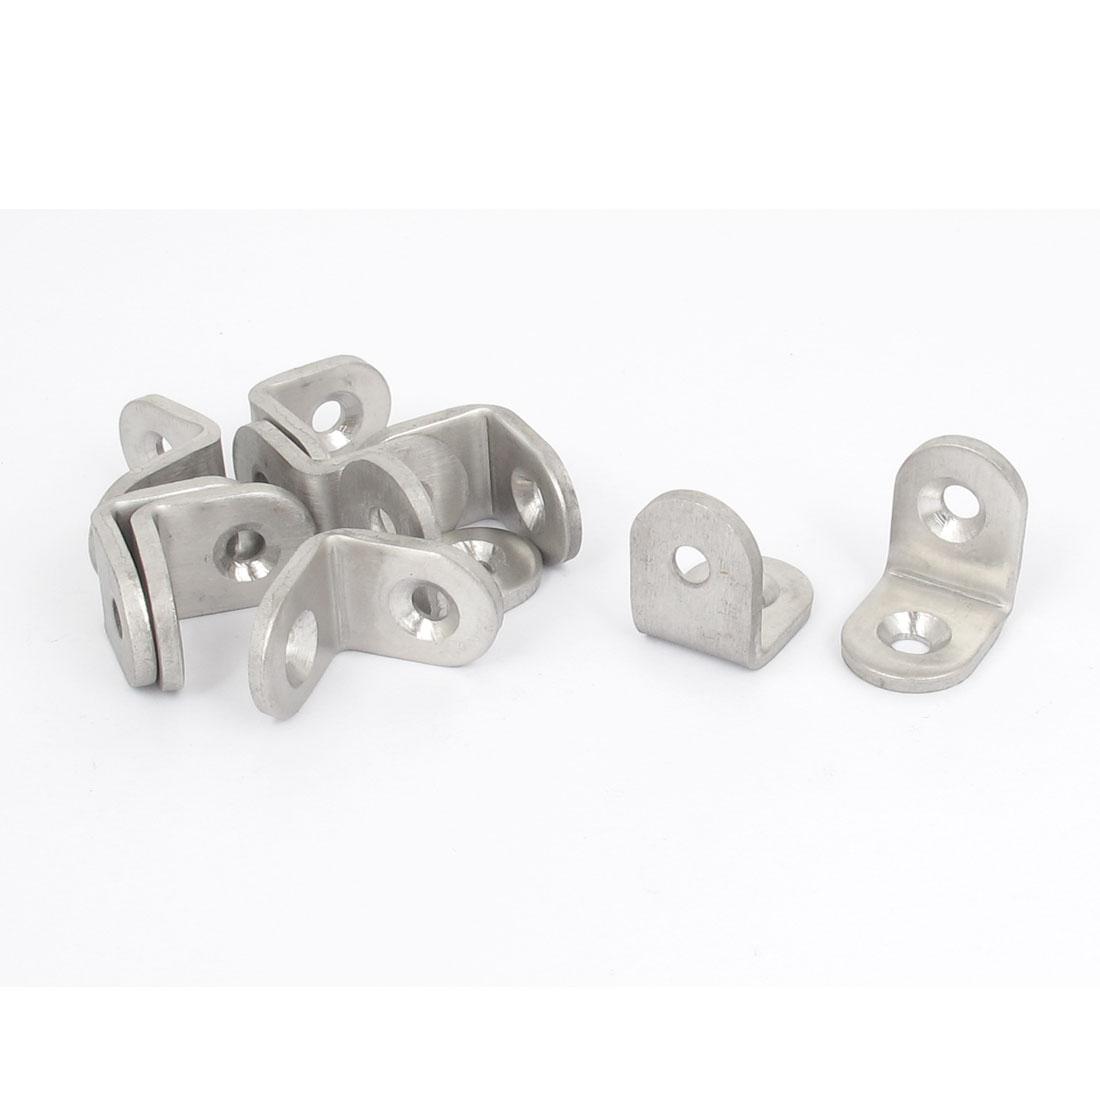 25mmx25mm L Shape Stainless Steel Shelf Corner Brace Repair Angle Bracket 10pcs